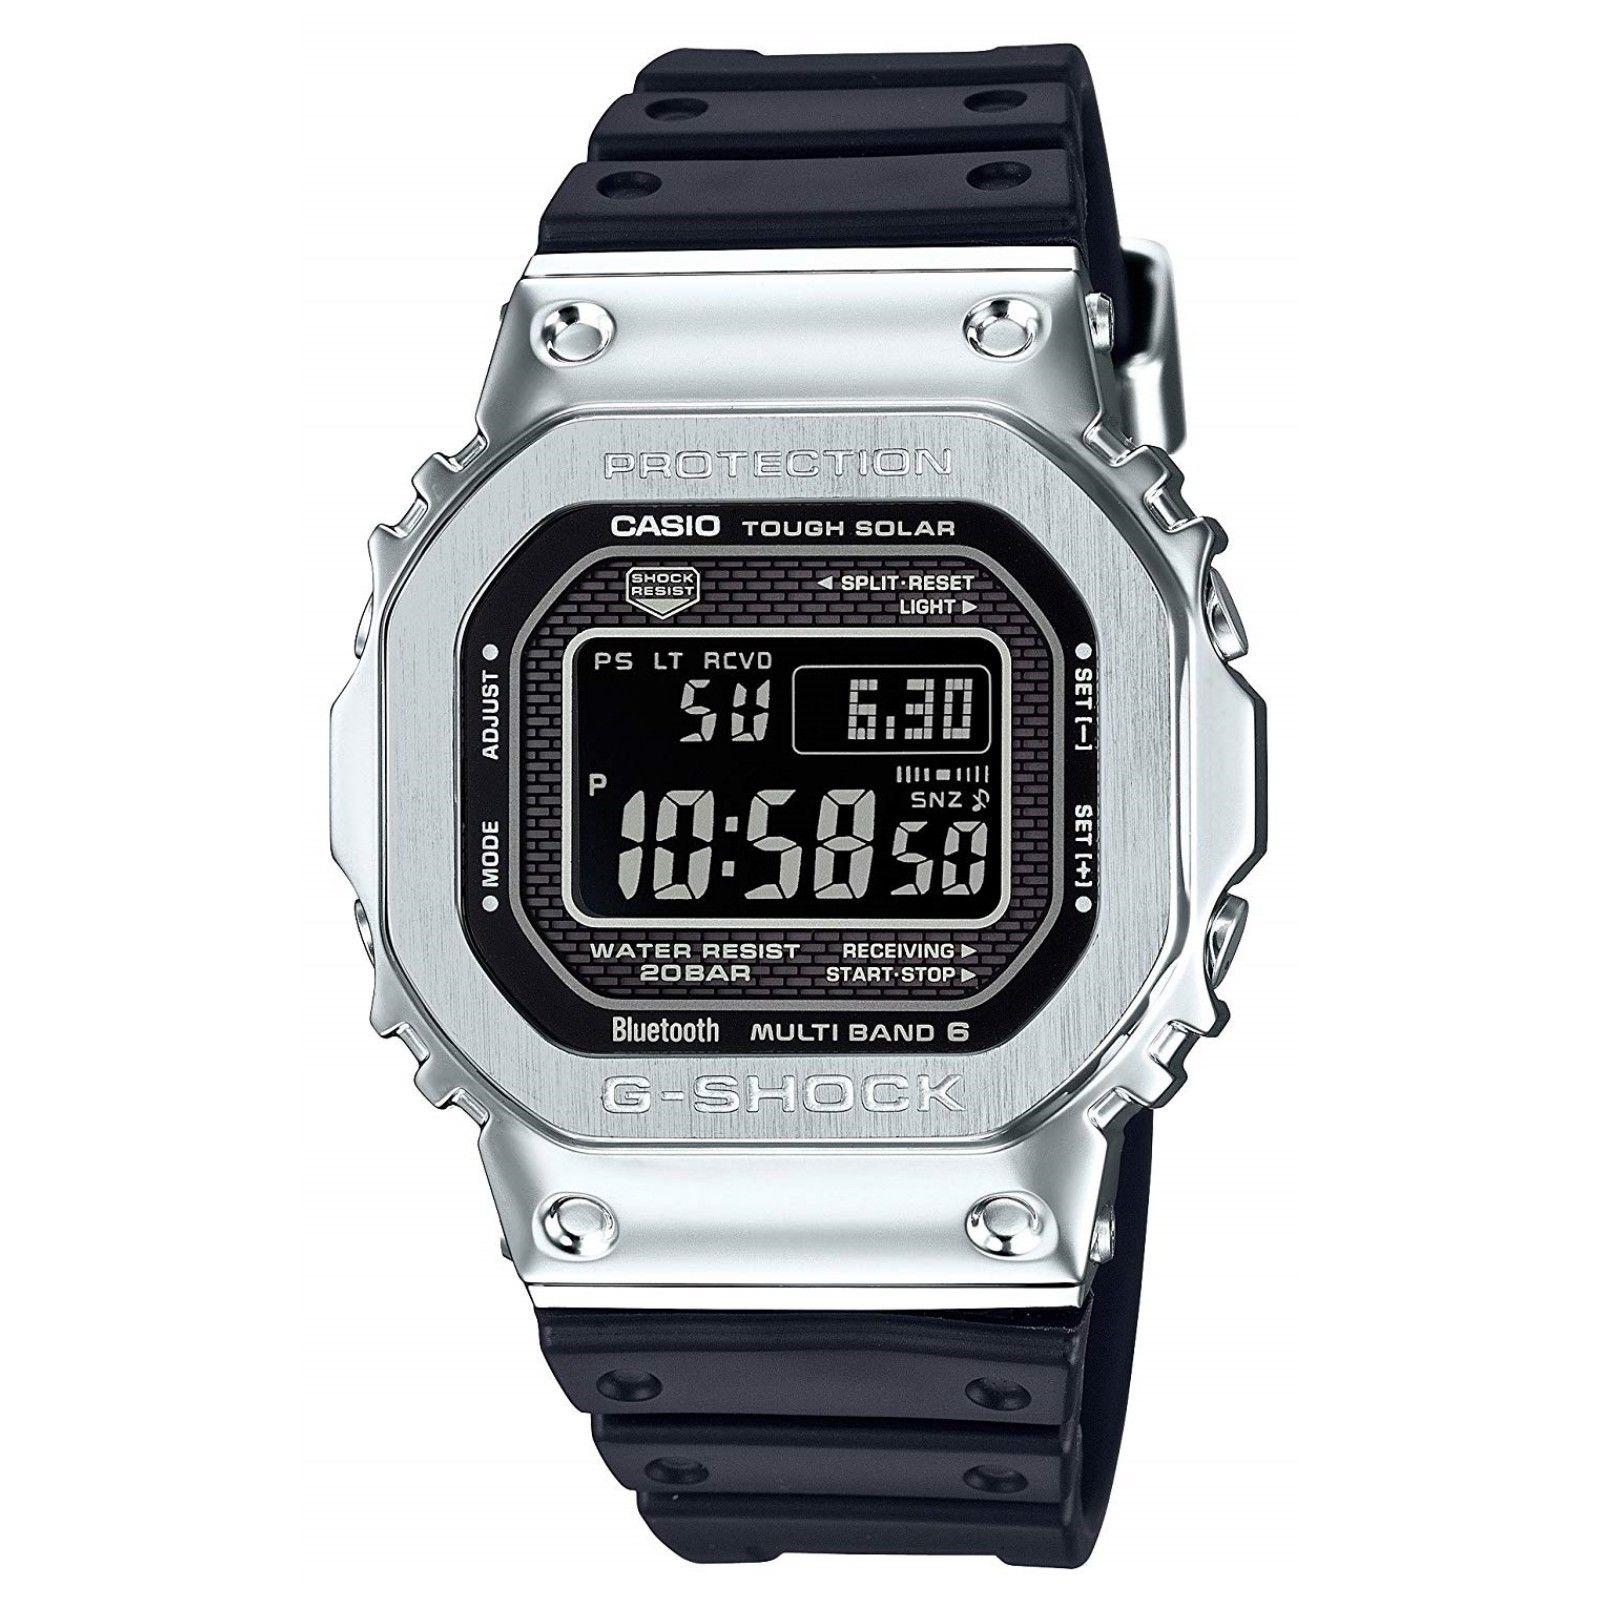 casio g-shock gmw-b5000-1er